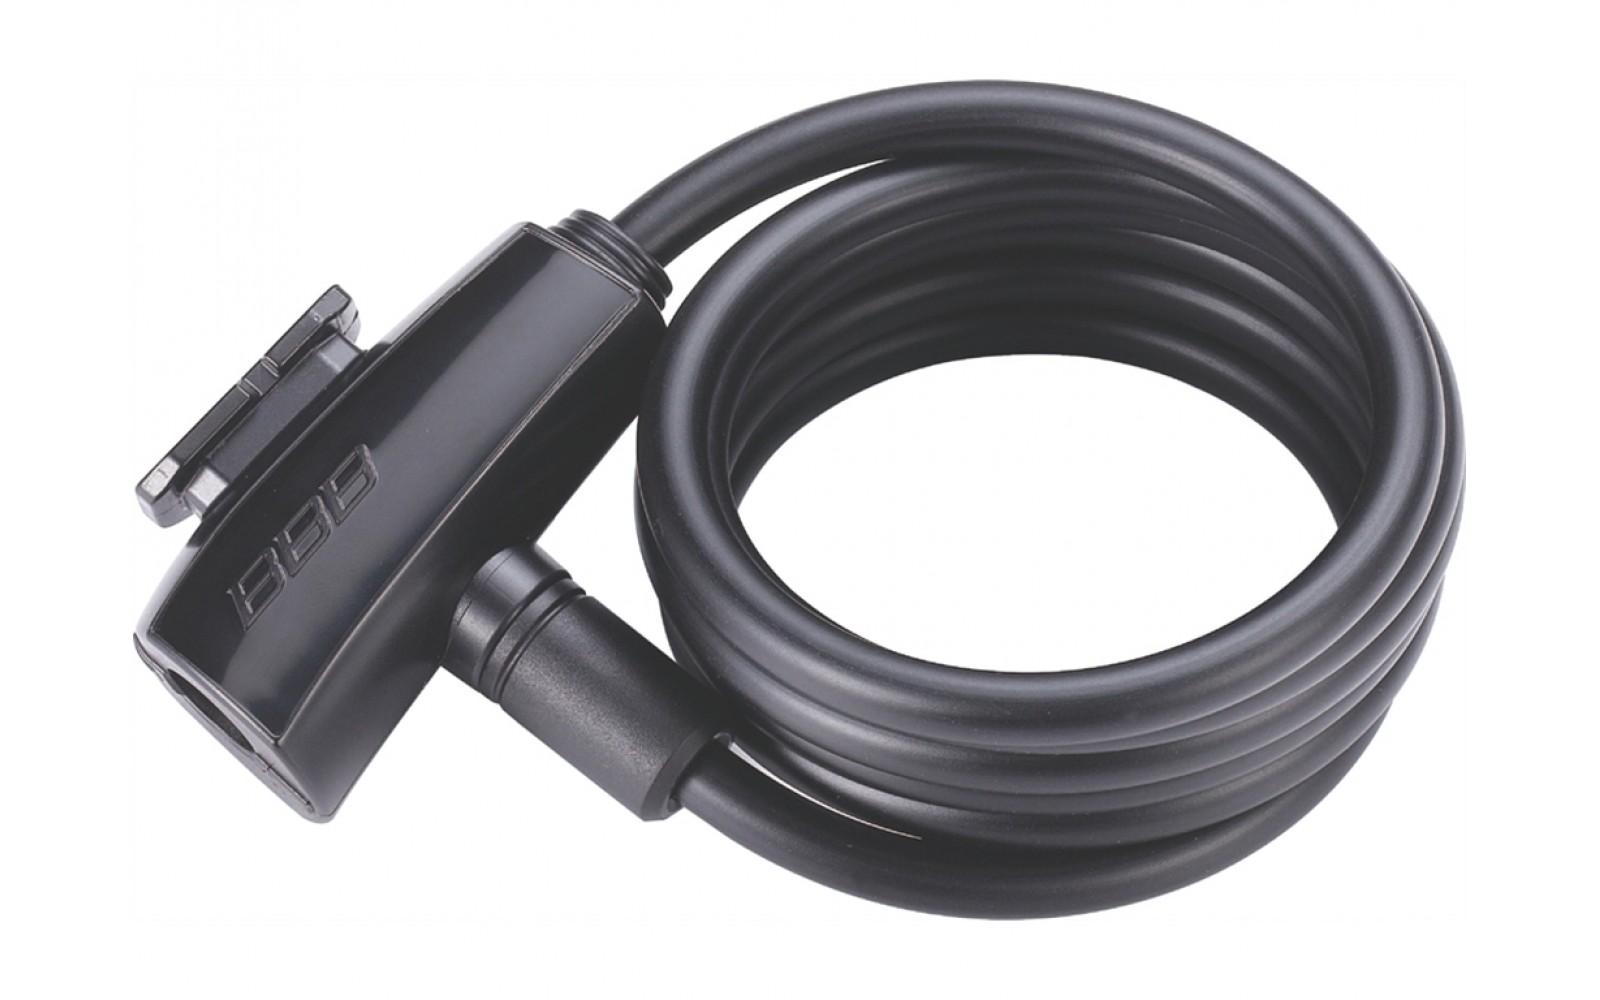 Замок на ключе для велосипеда BBB BBL-61 QuickSafe 8 мм x 1500 мм (2017)